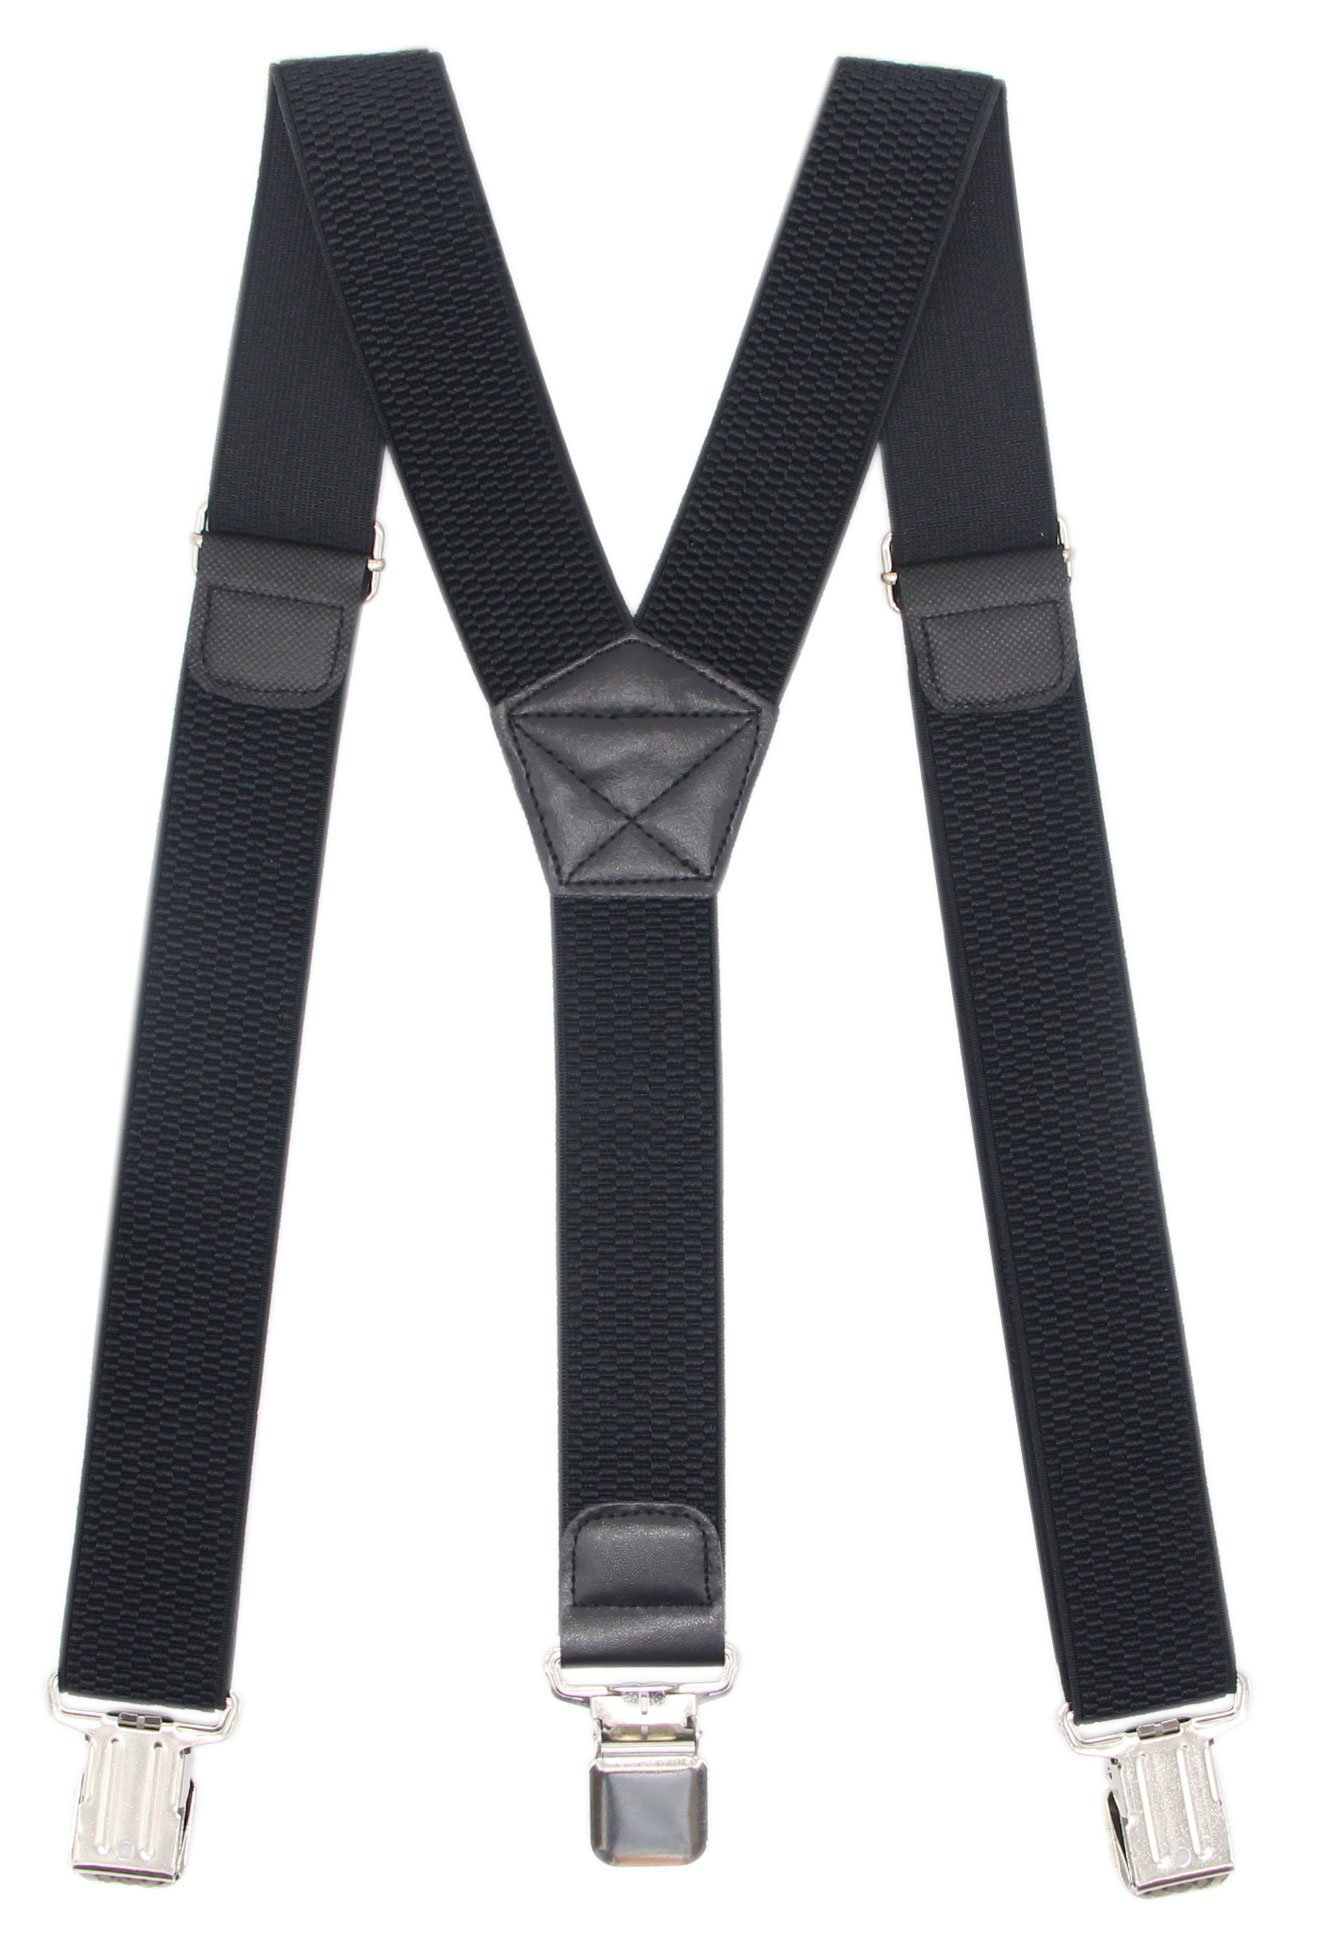 JAIFEI Men's Y Shape Wide Suspenders - Heavy Duty With Strong Clips (Black) by JAIFEI